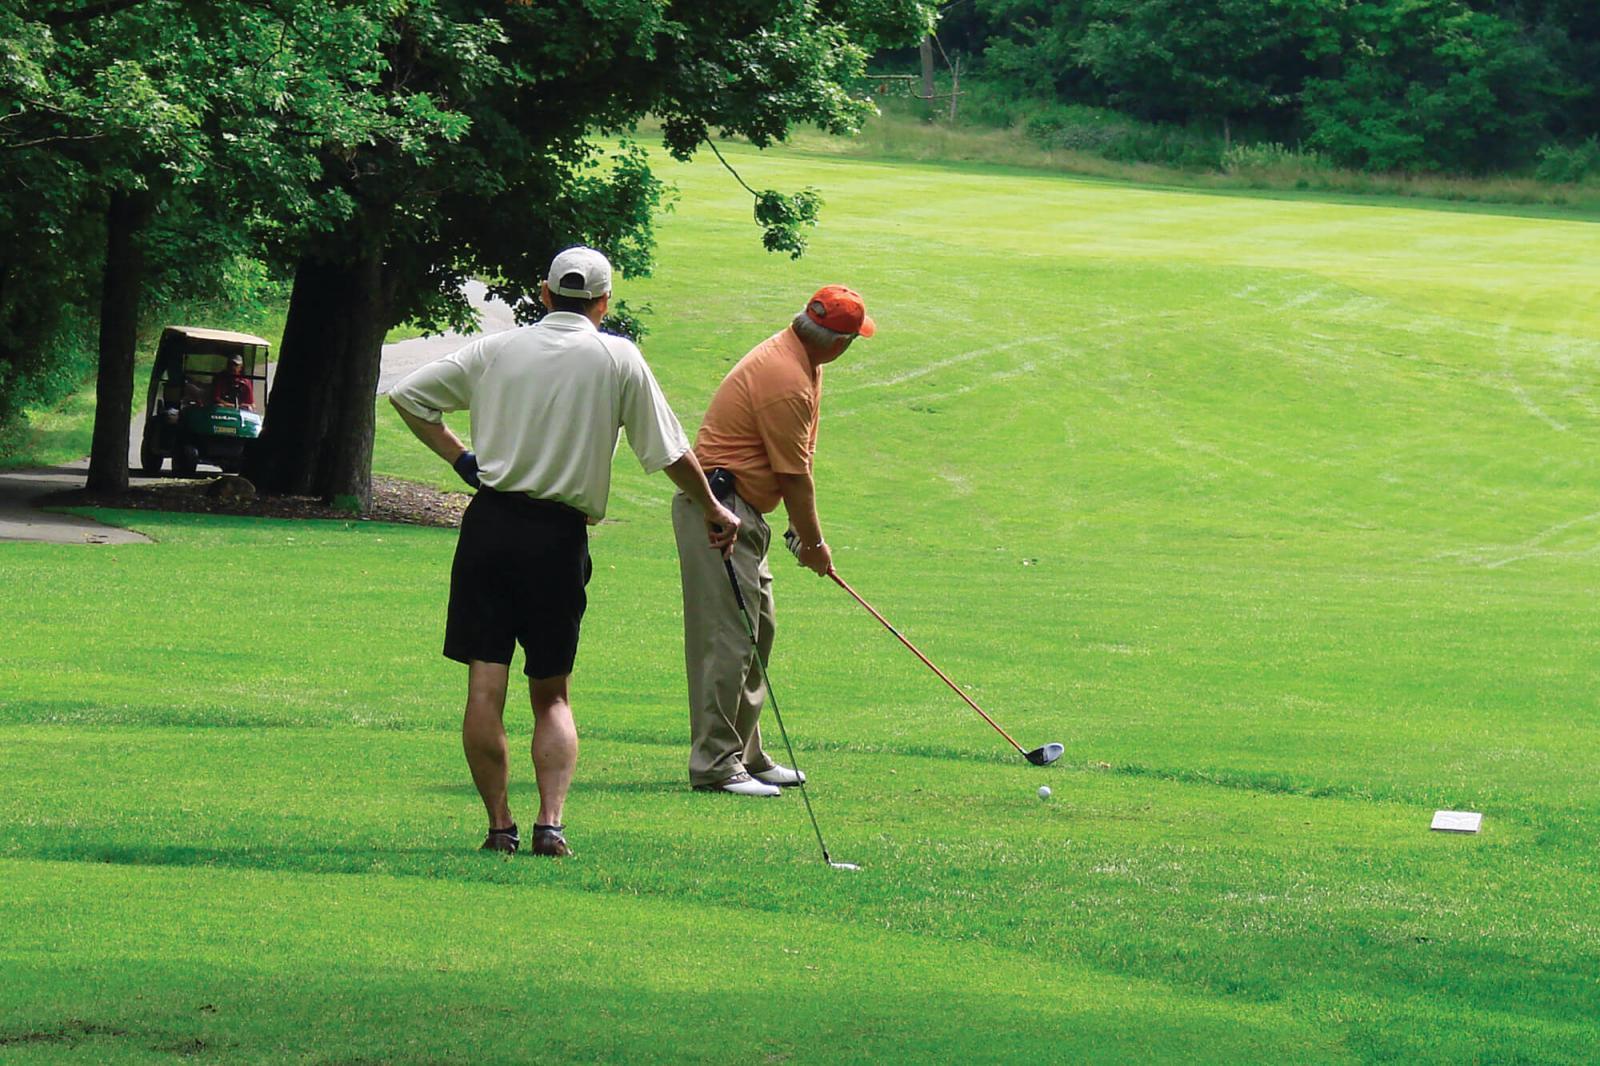 Can you believe it's golf season already?